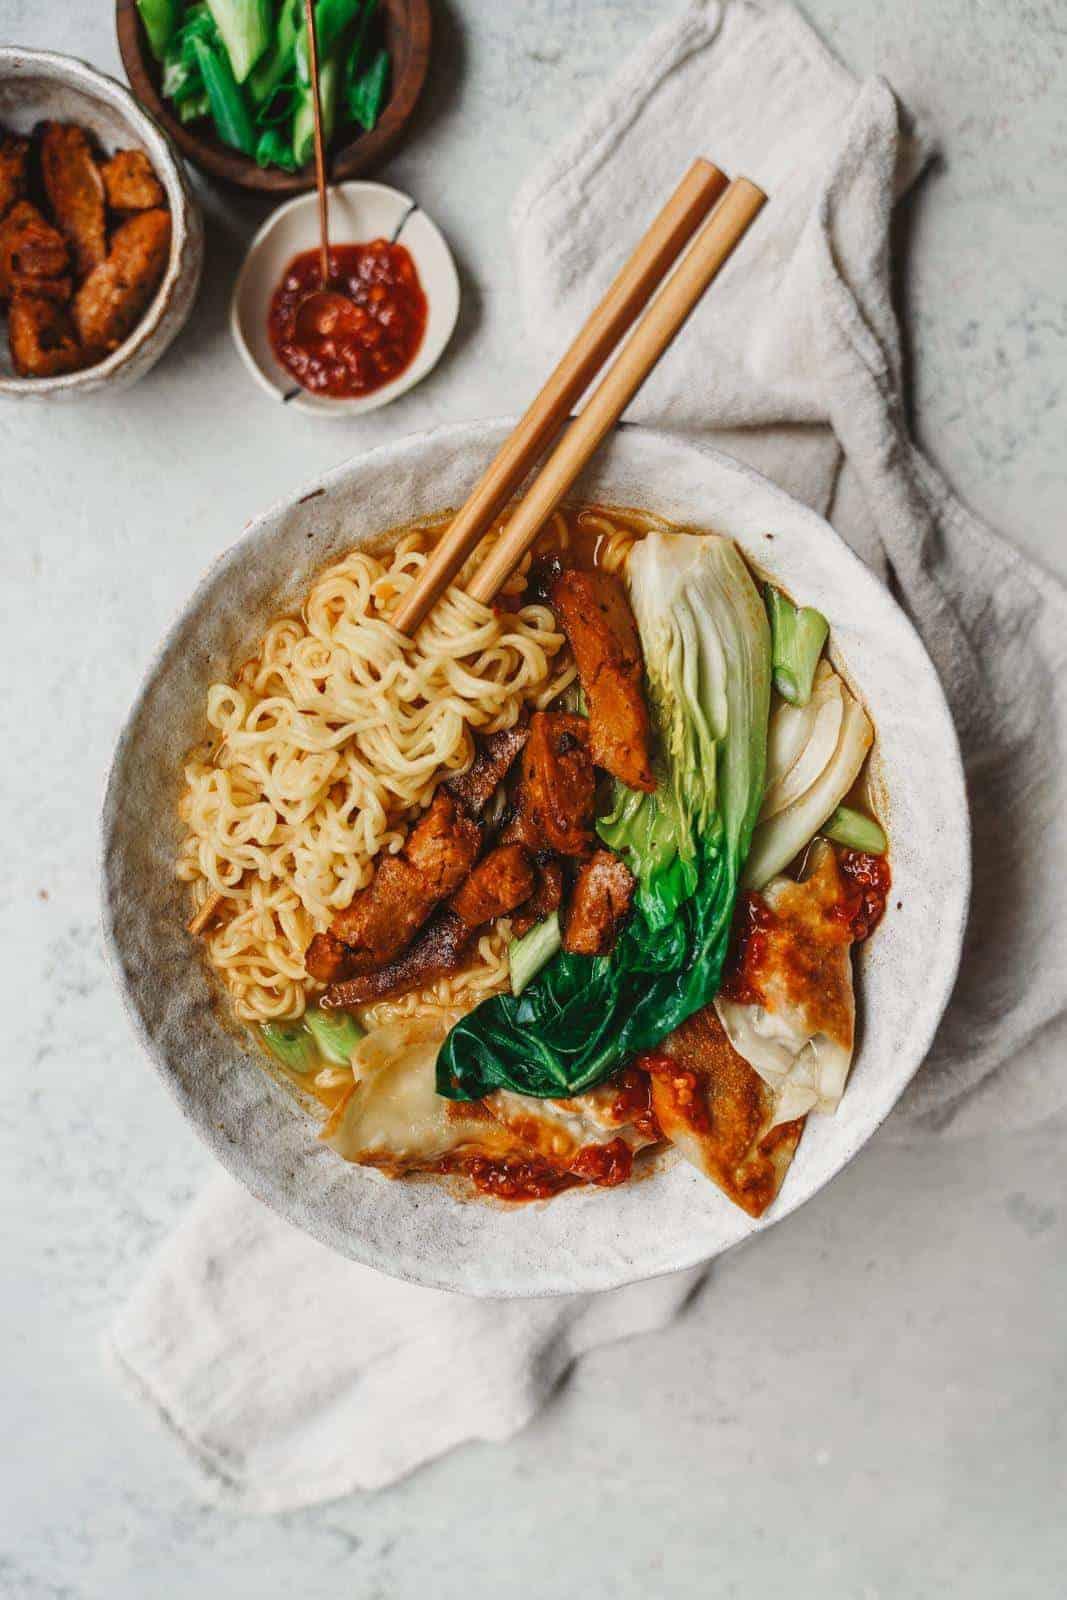 Bowl of creamy vegan ramen with chopsticks